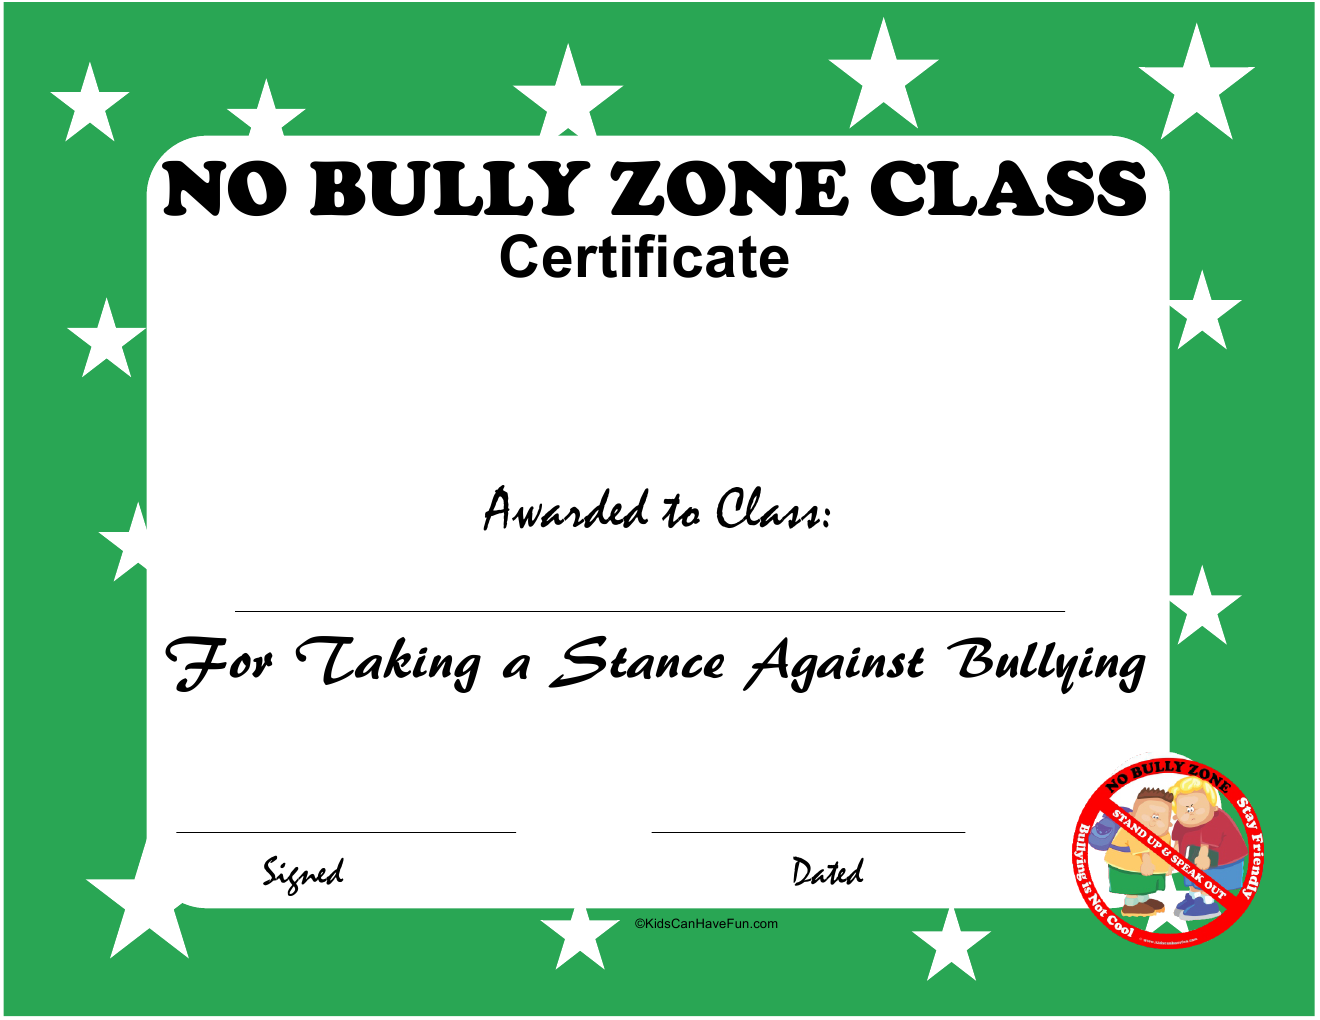 No Bully Zone Class Certificate Homeschool Pinterest Anti